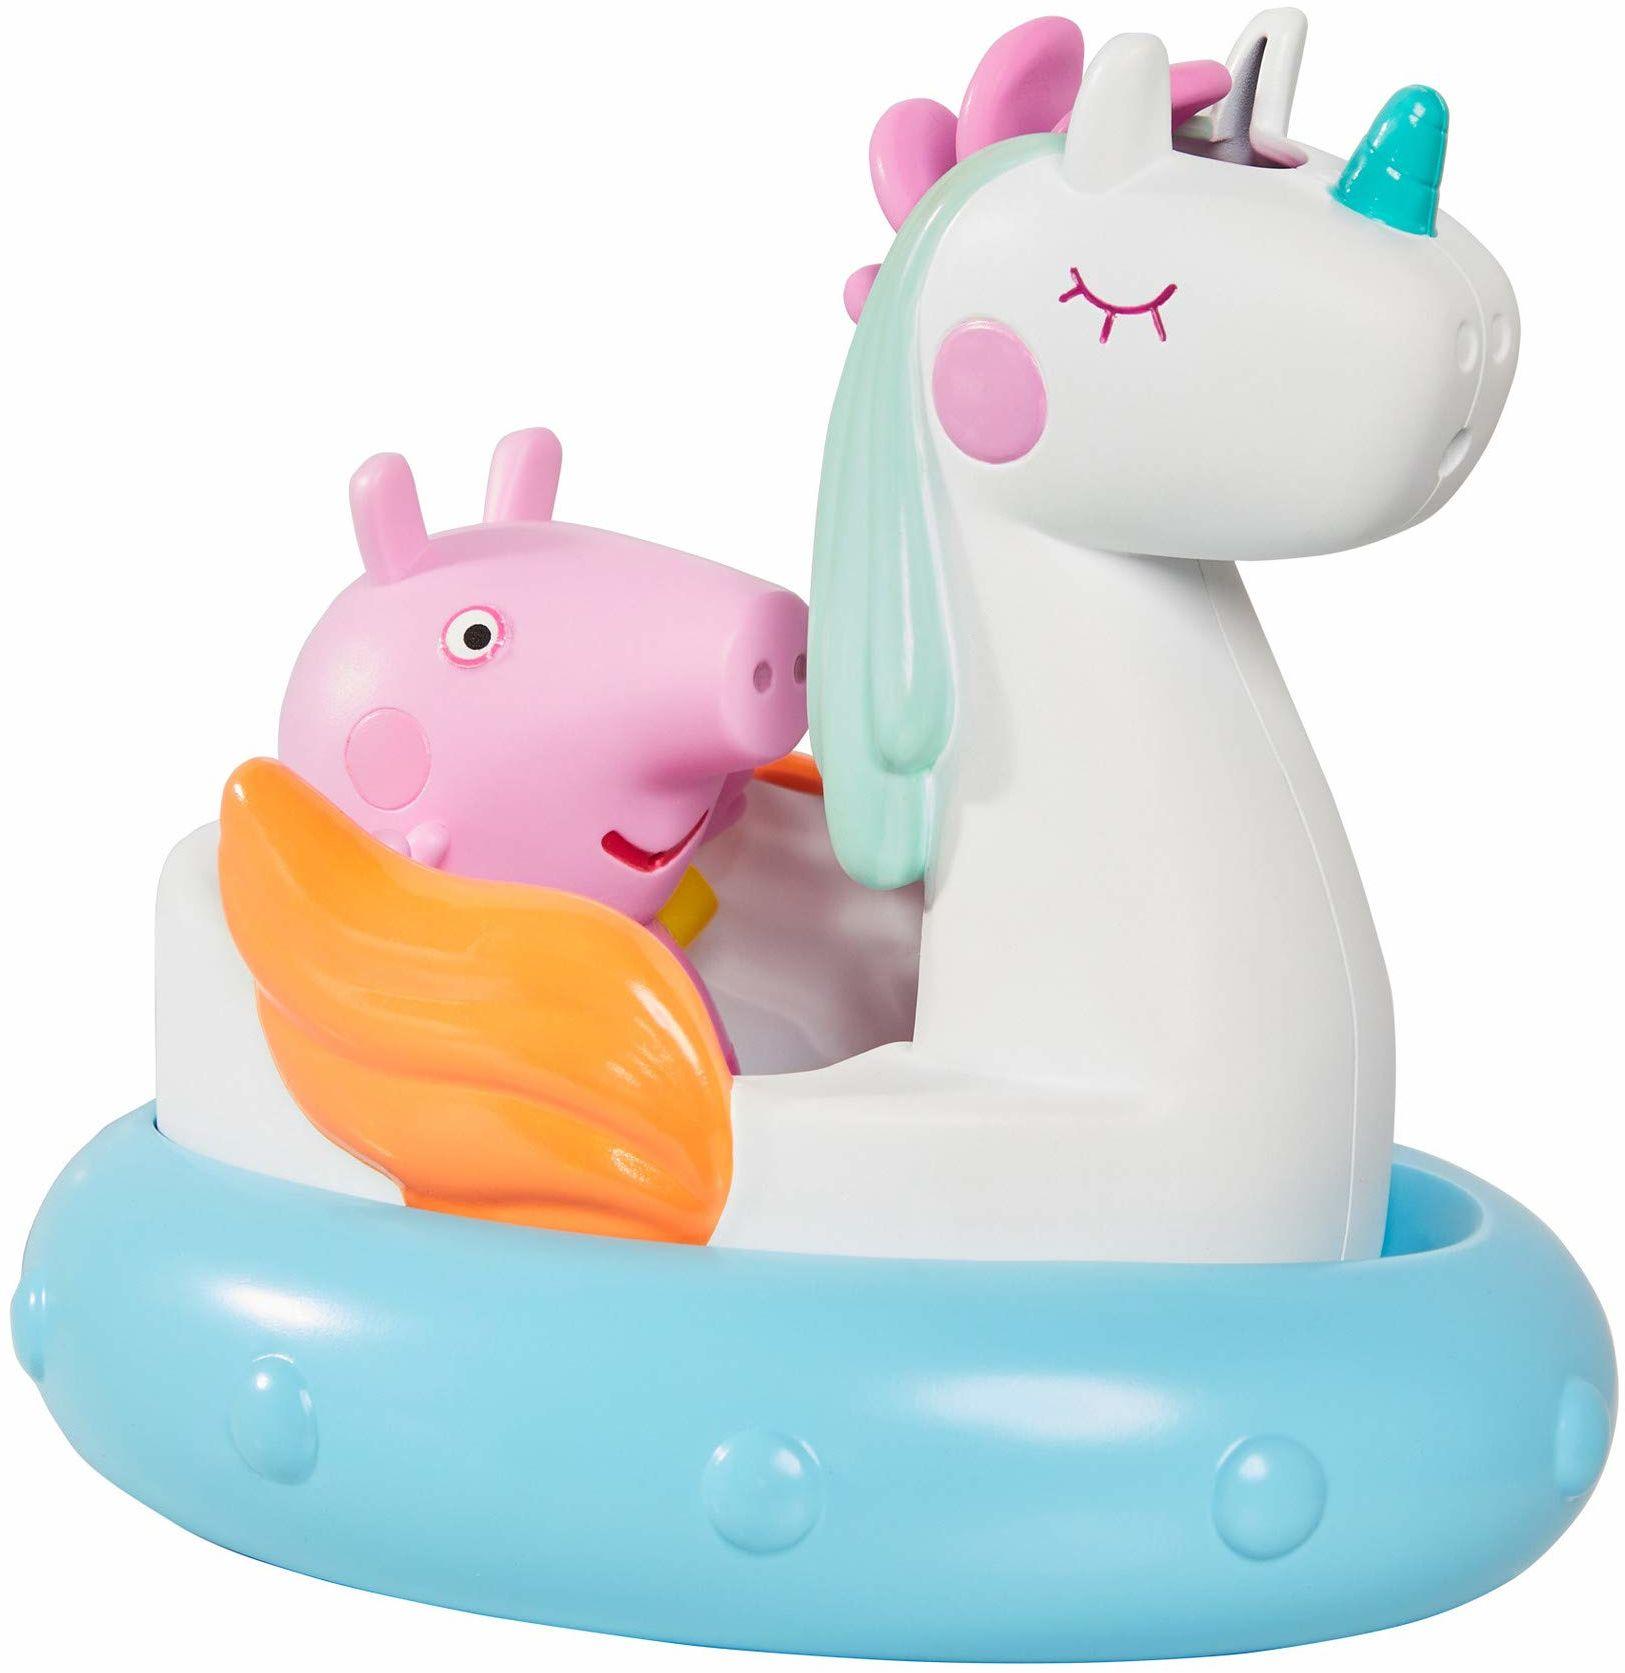 TOOMIES E73160 zabawka do kąpieli